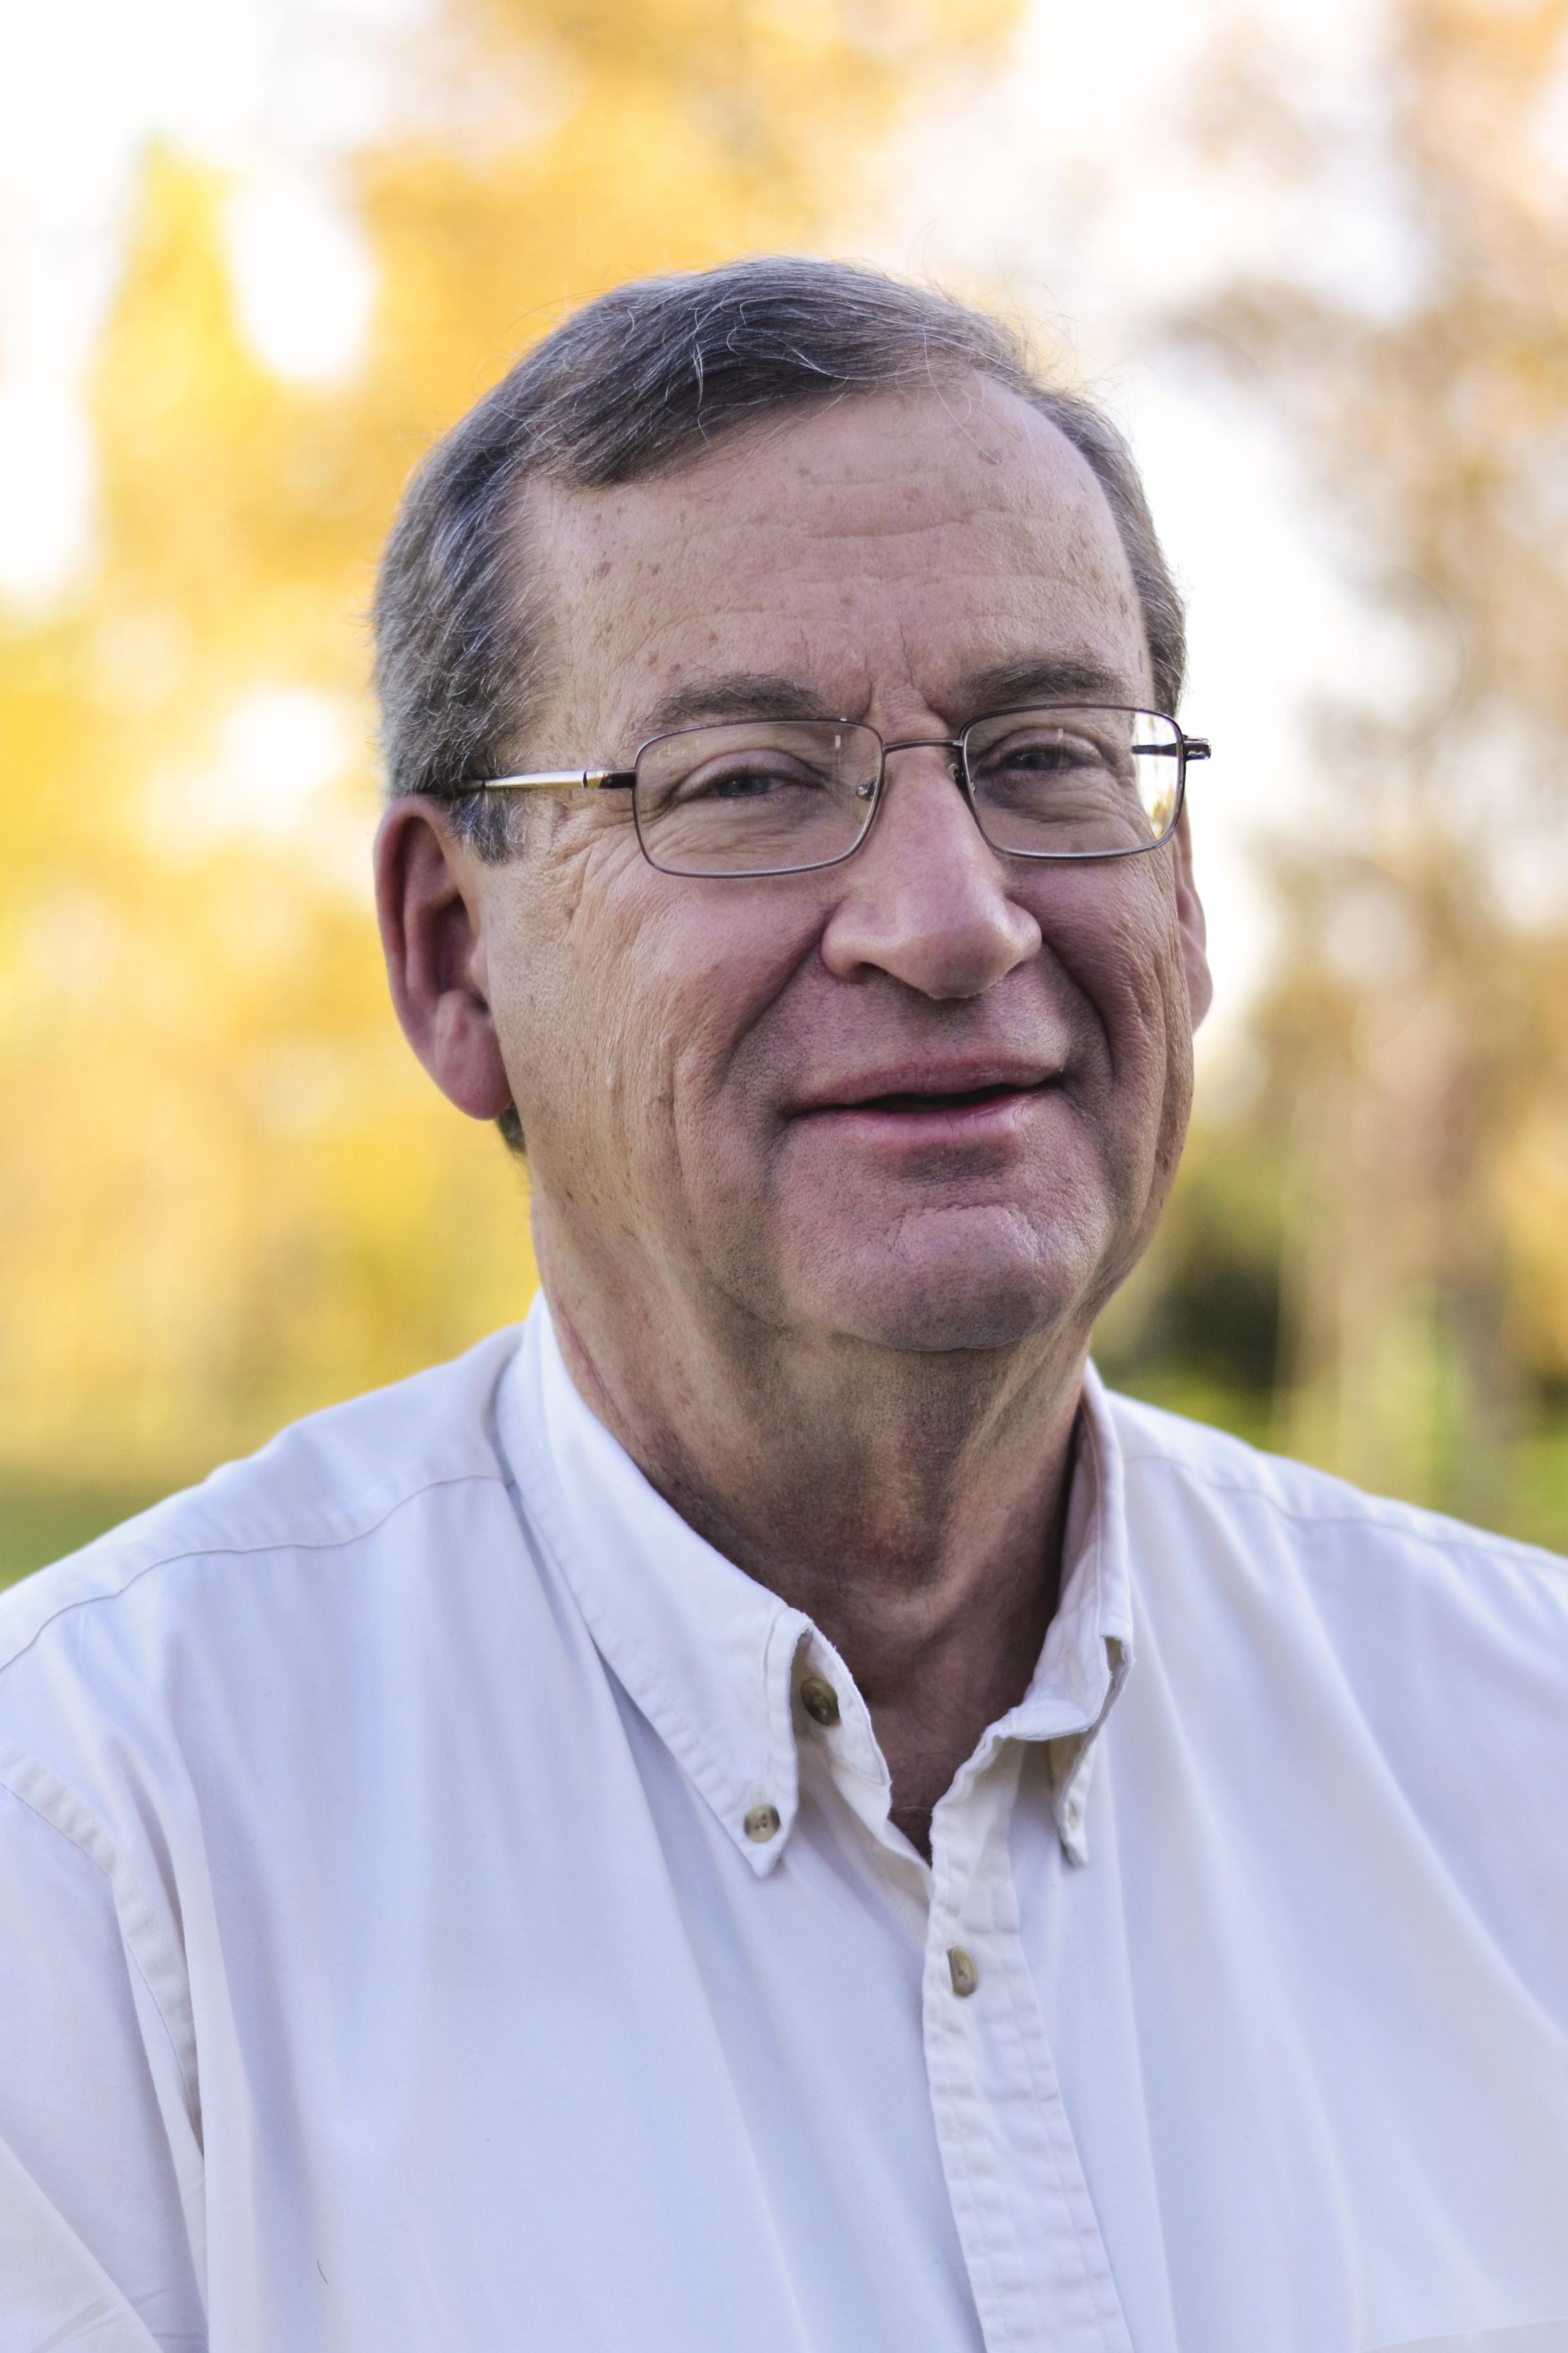 John O'Mara, President